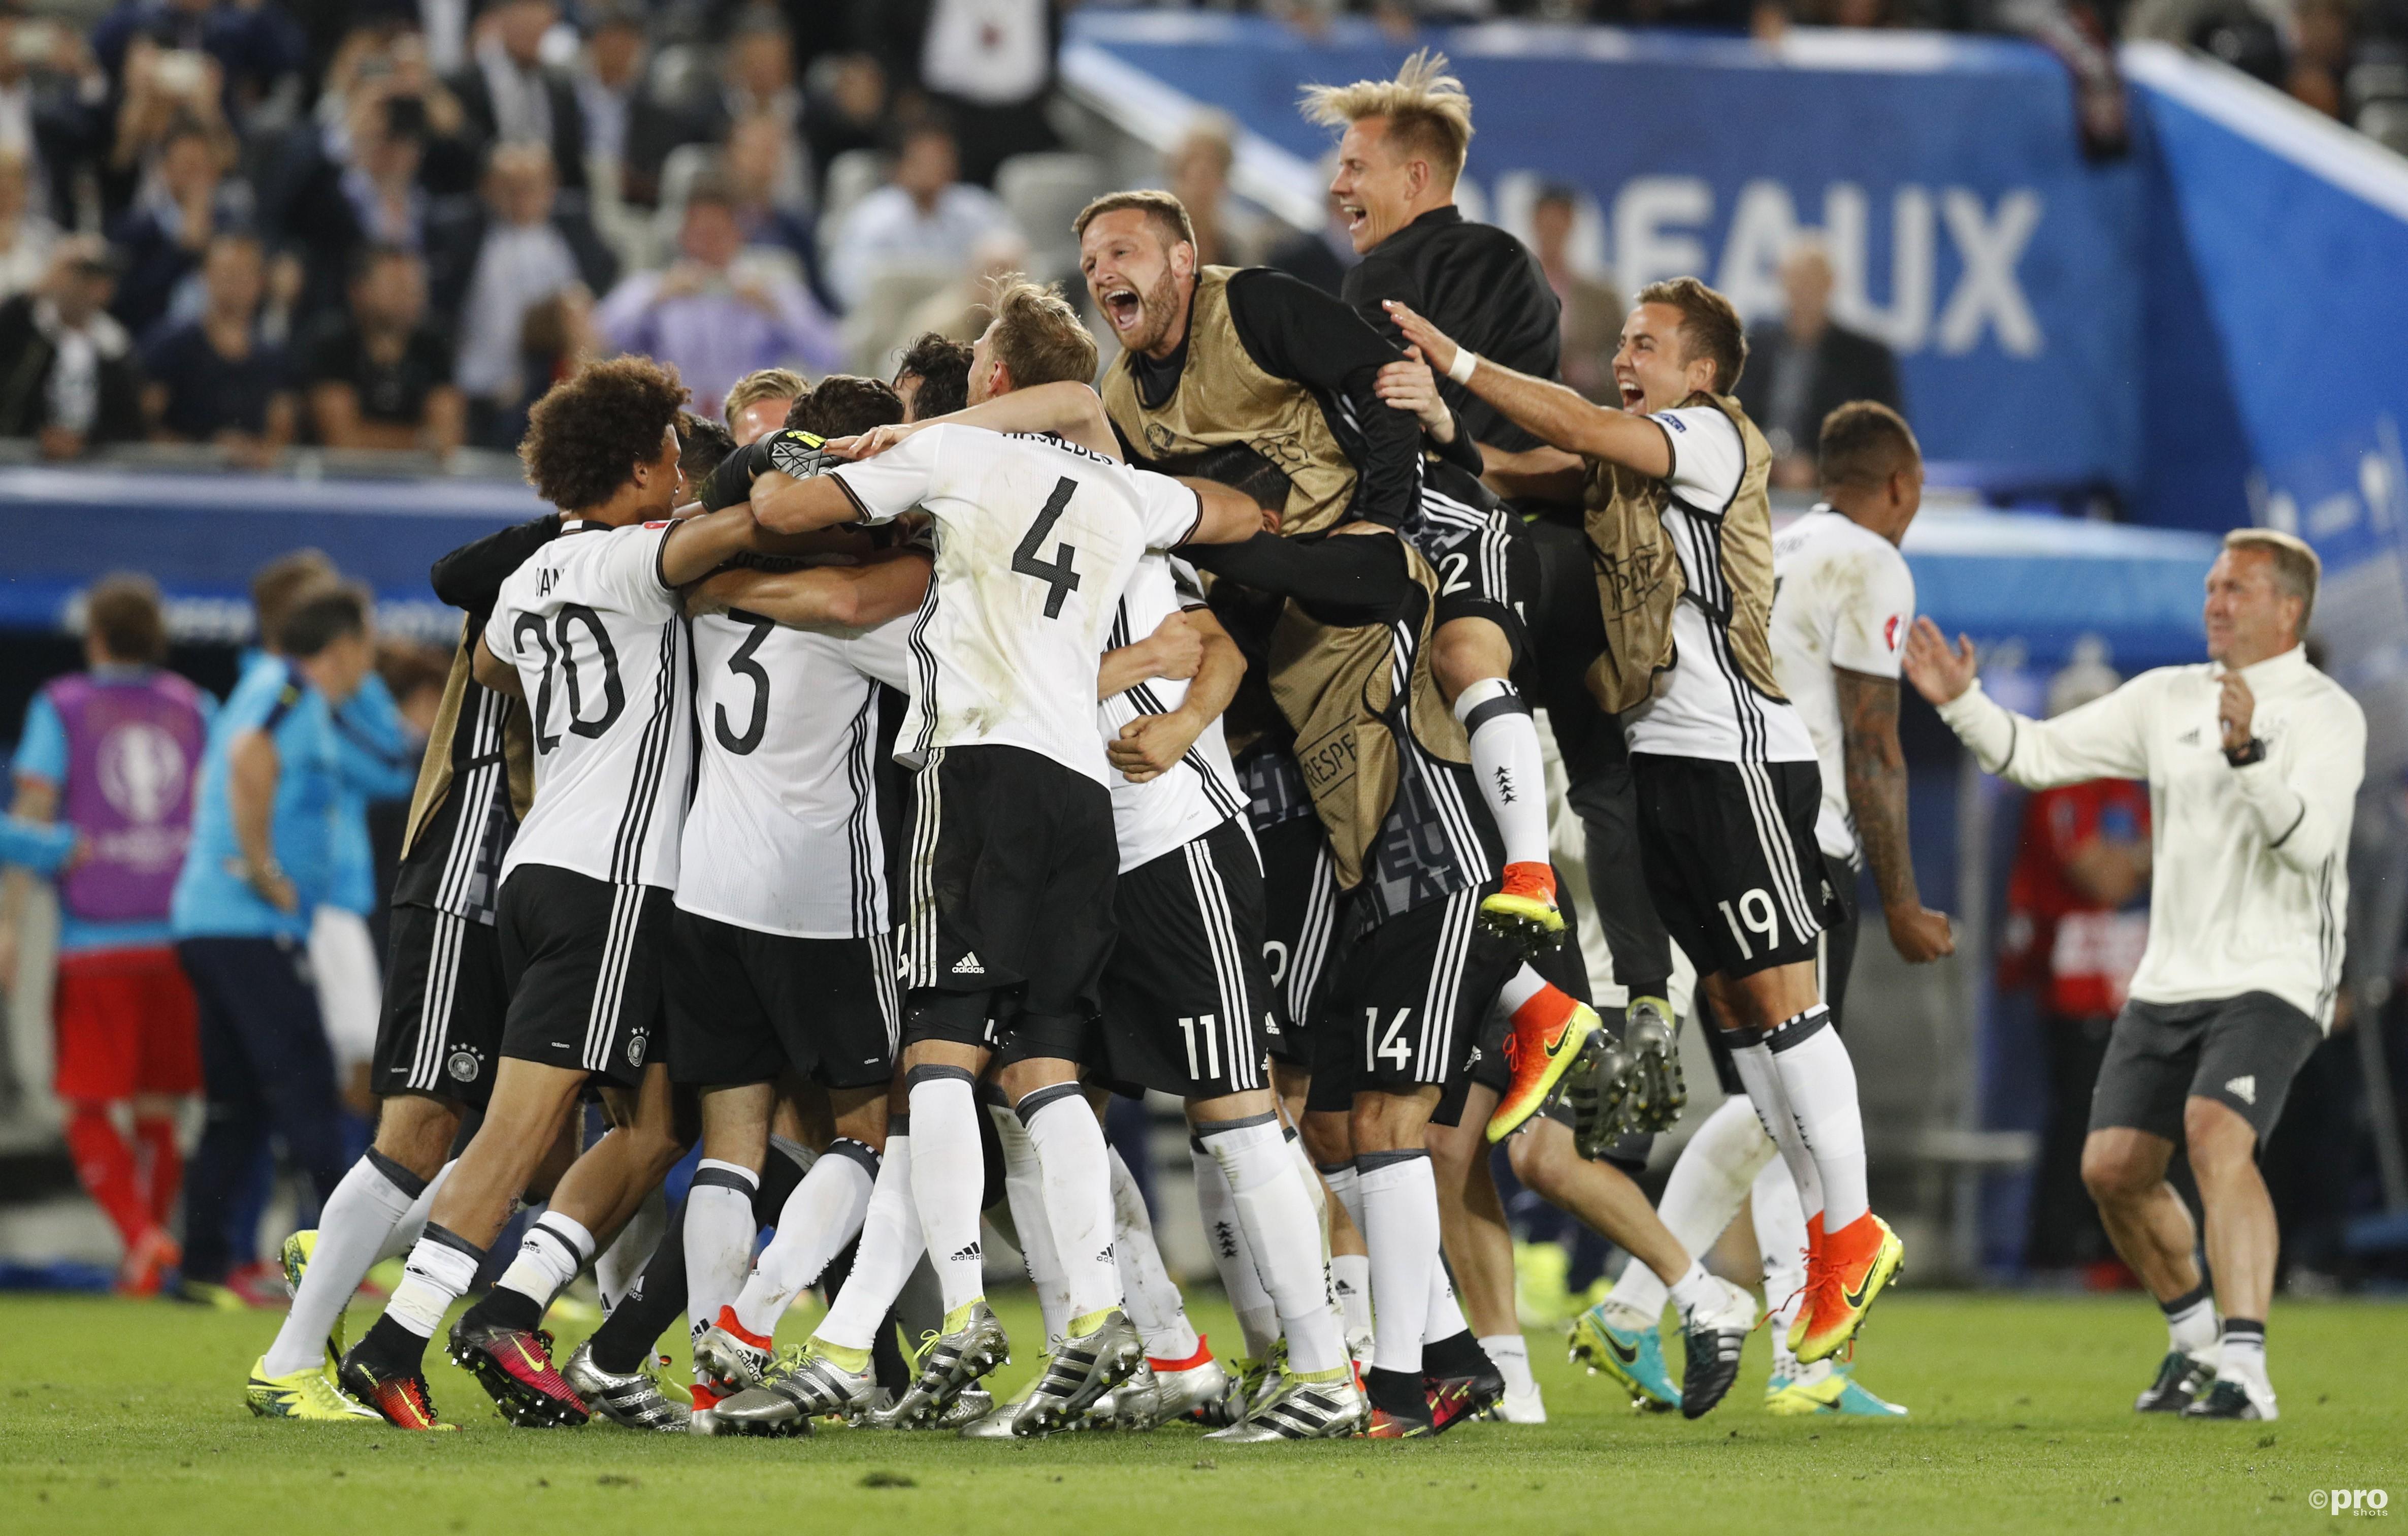 Duitsland viert feest na de strafschoppen. (PRO SHOTS/Action Images)